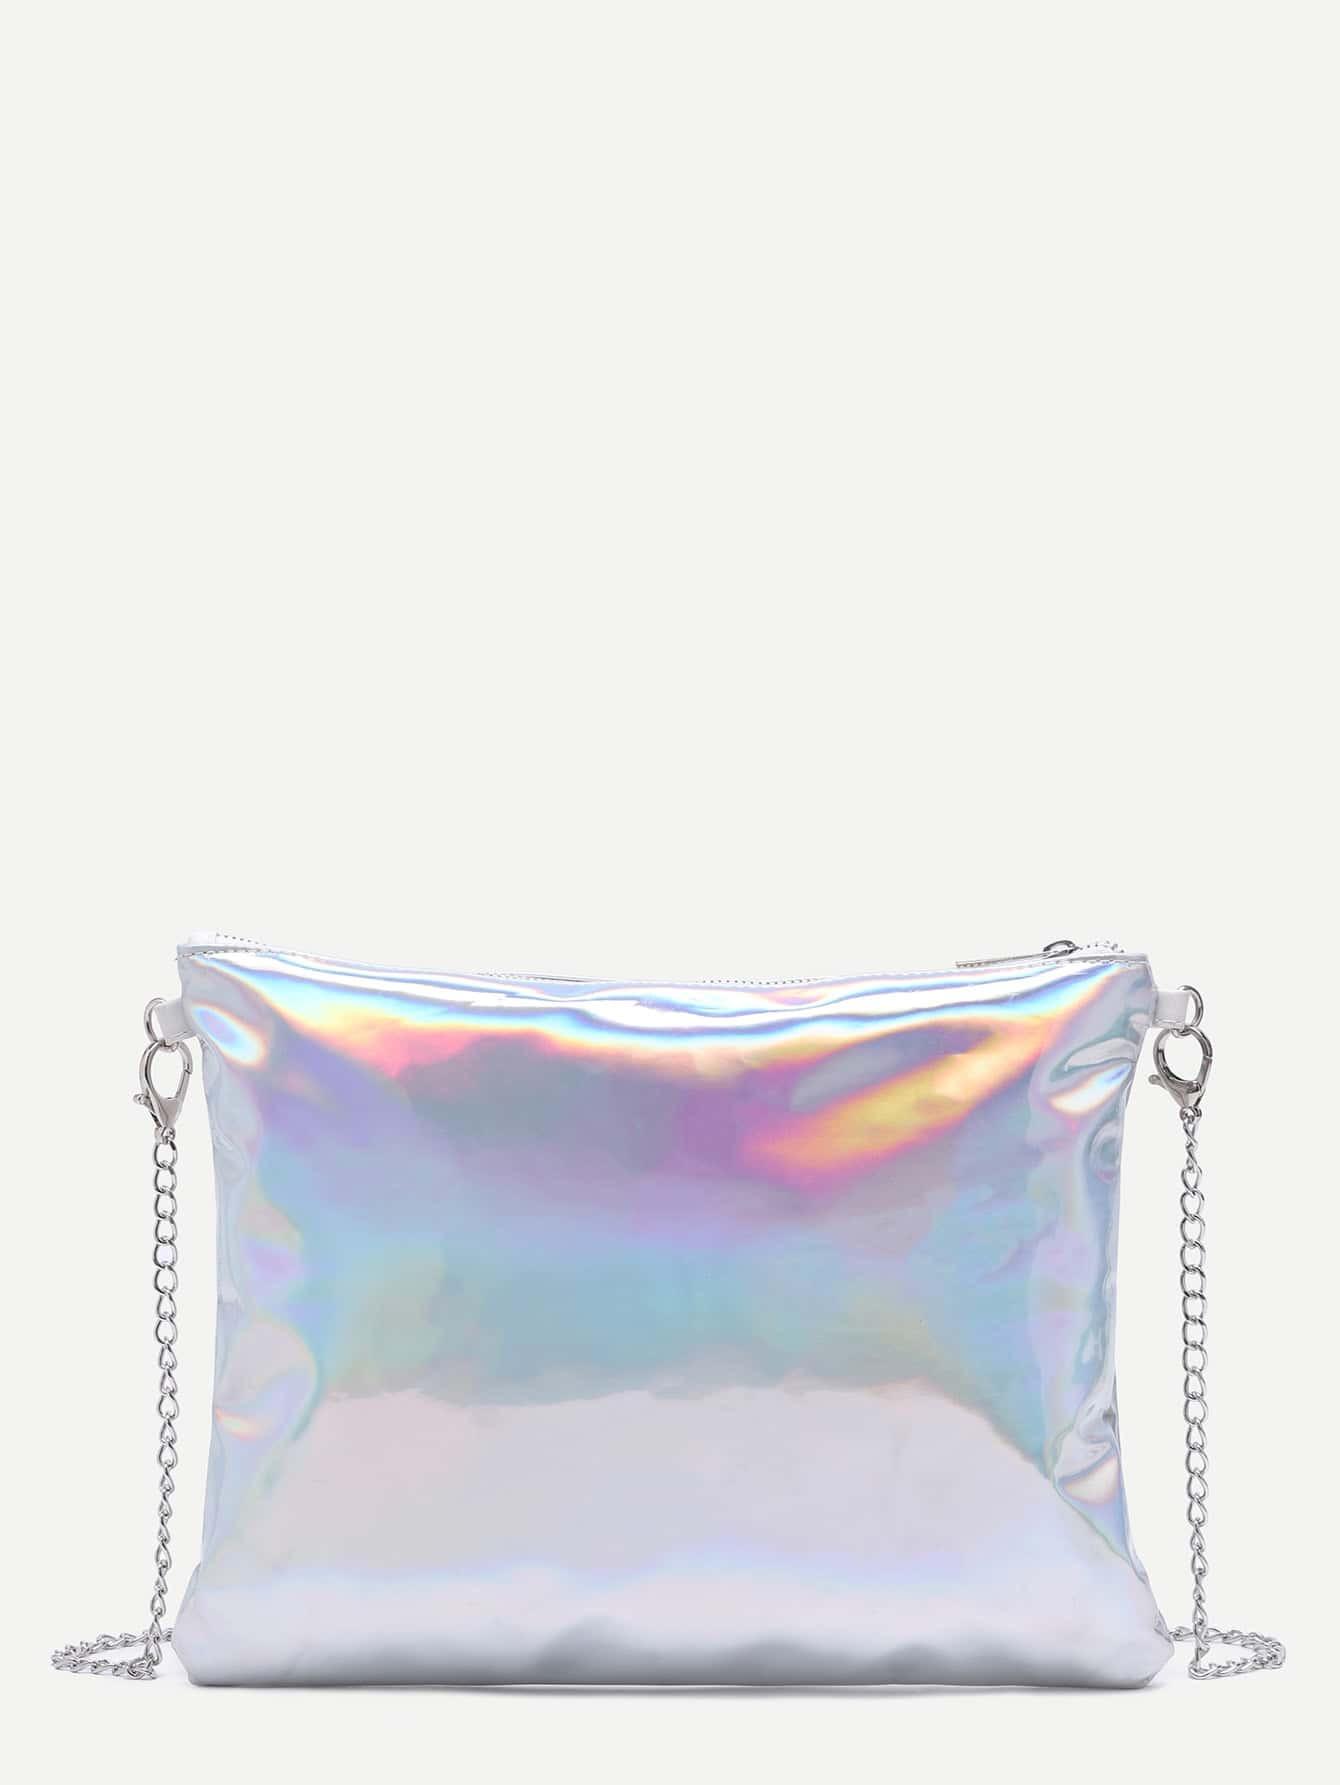 bag161104901_2